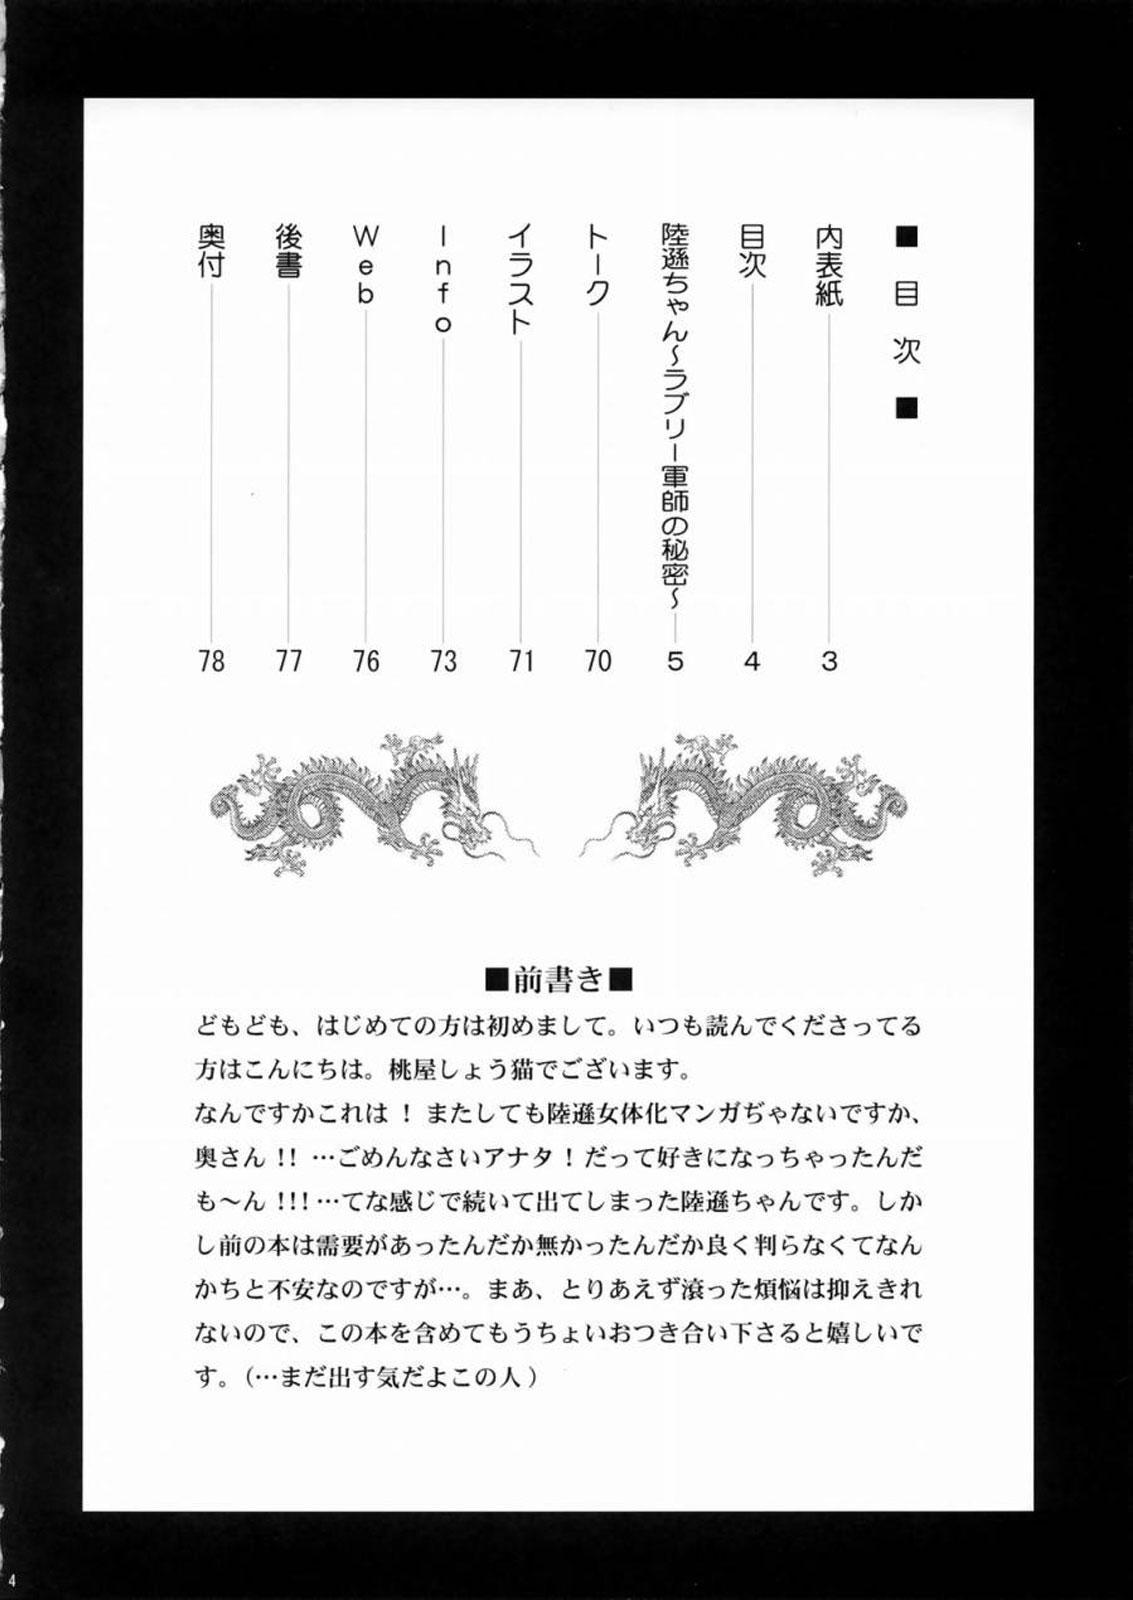 (C66) [U.R.C (Momoya Show-Neko)] Rikuson-chan ~Lovely Gunshi no Himitsu~ | Rikuson-chan Secret of The Lovely Strategist (Dynasty Warriors) [English] [SaHa] 2